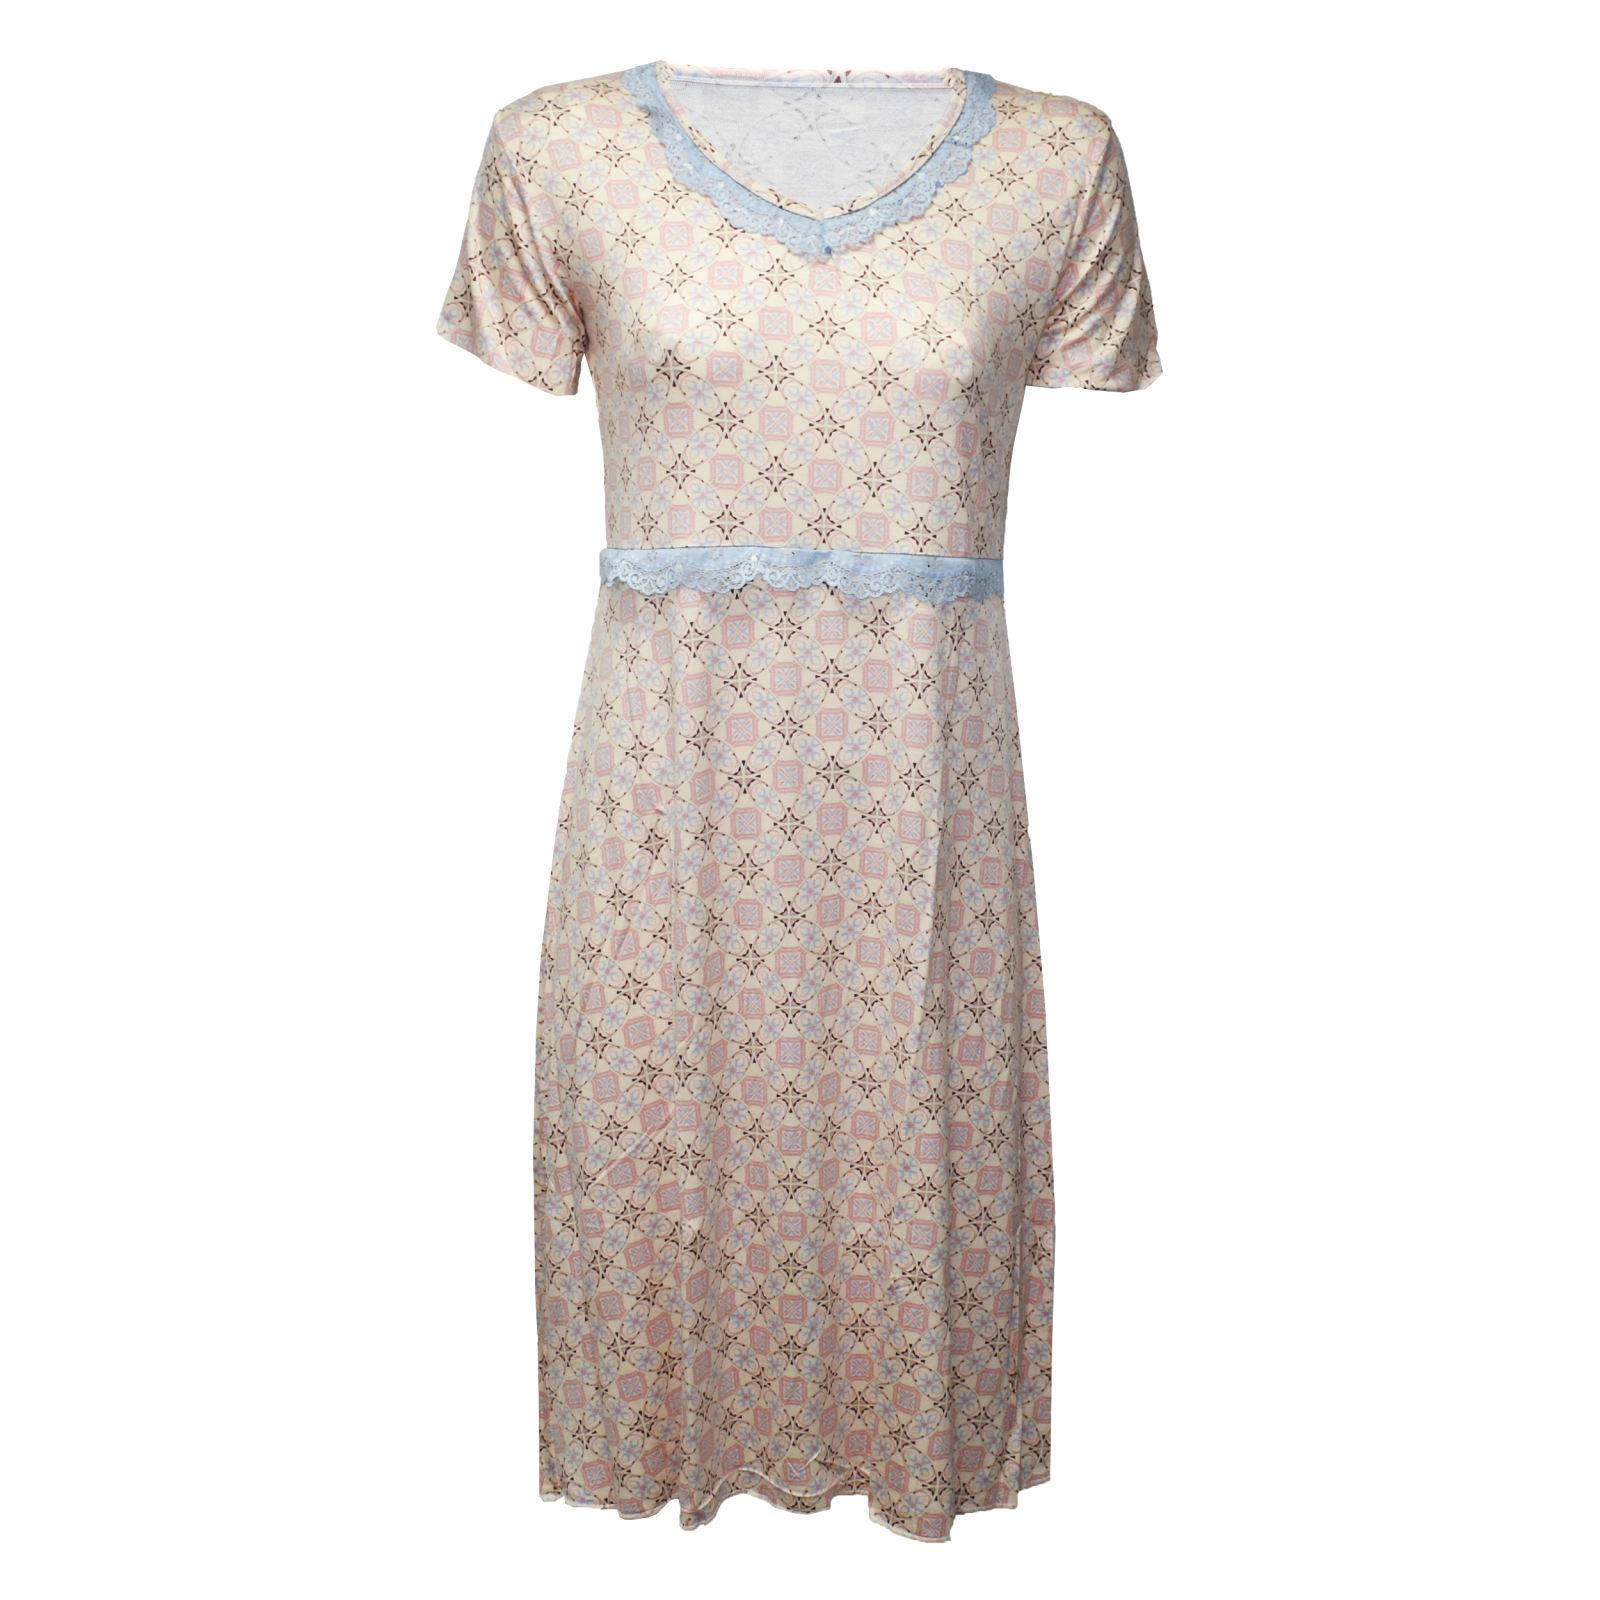 پیراهن زنانه بیکنکا کد ۲۶۲۹